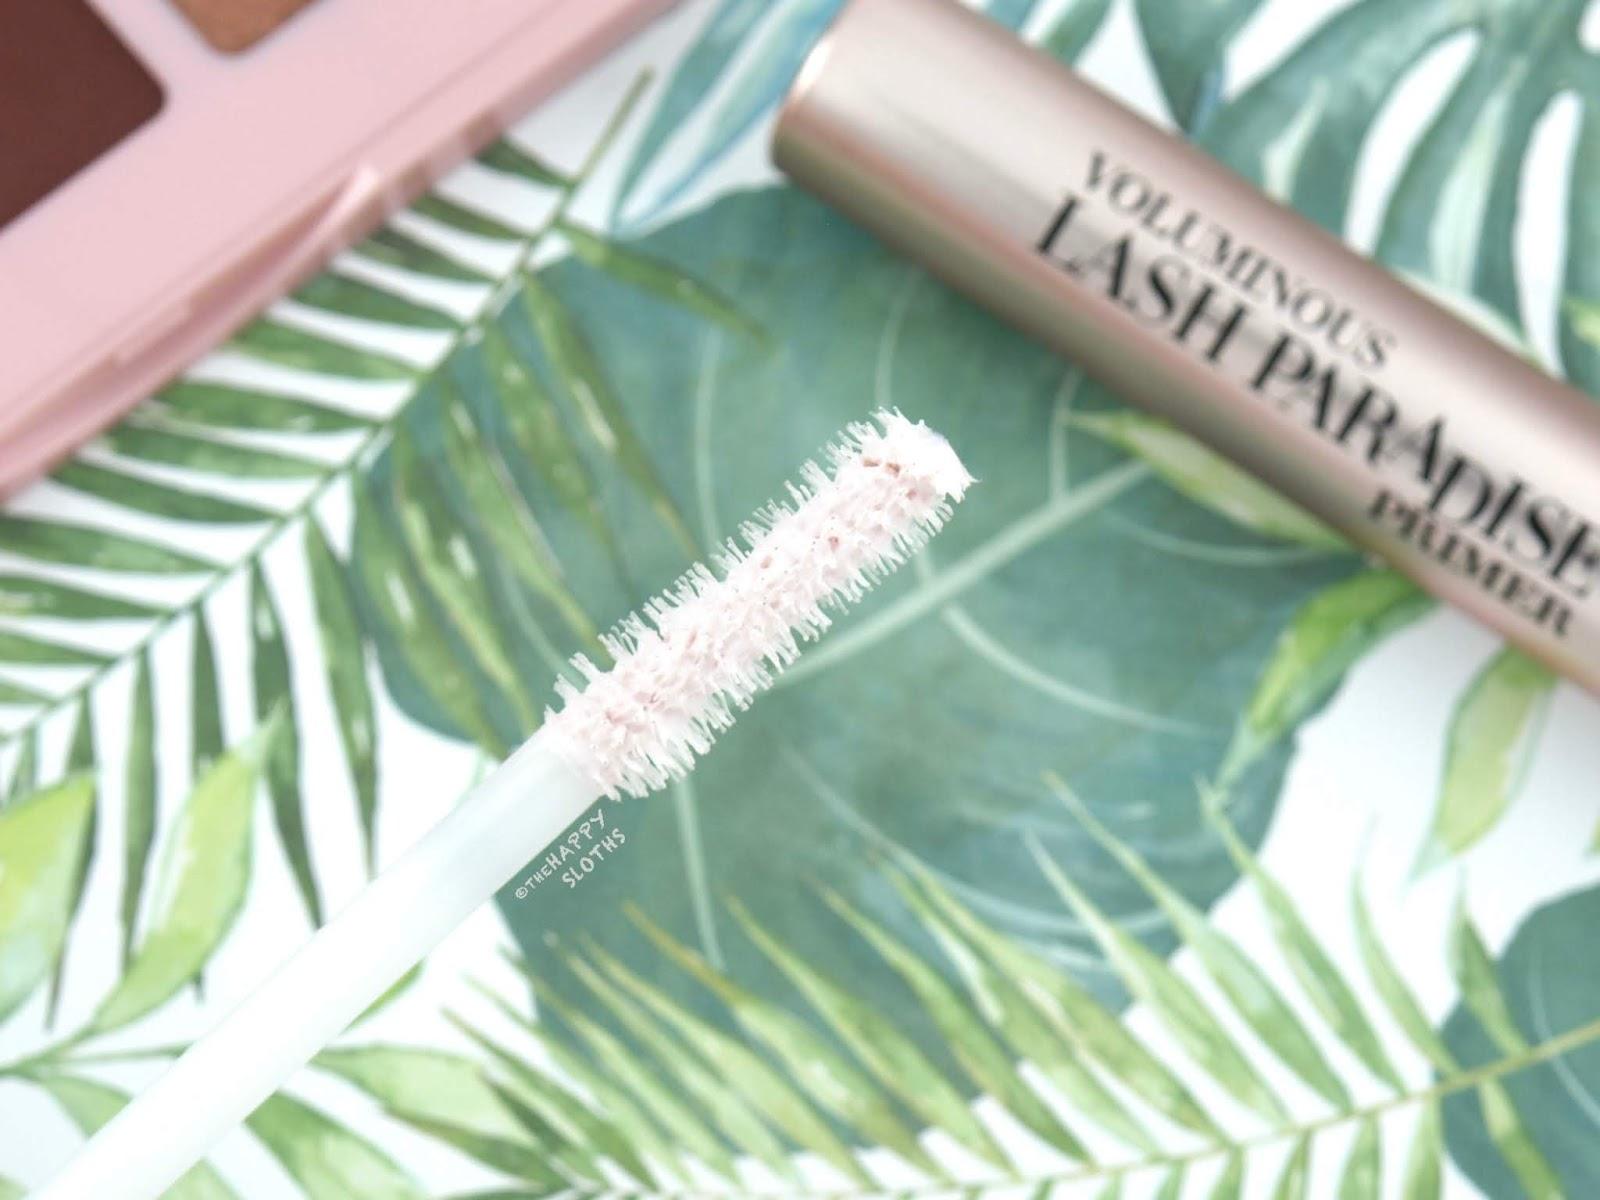 L'Oreal | Voluminous Lash Paradise Mascara Primer: Review